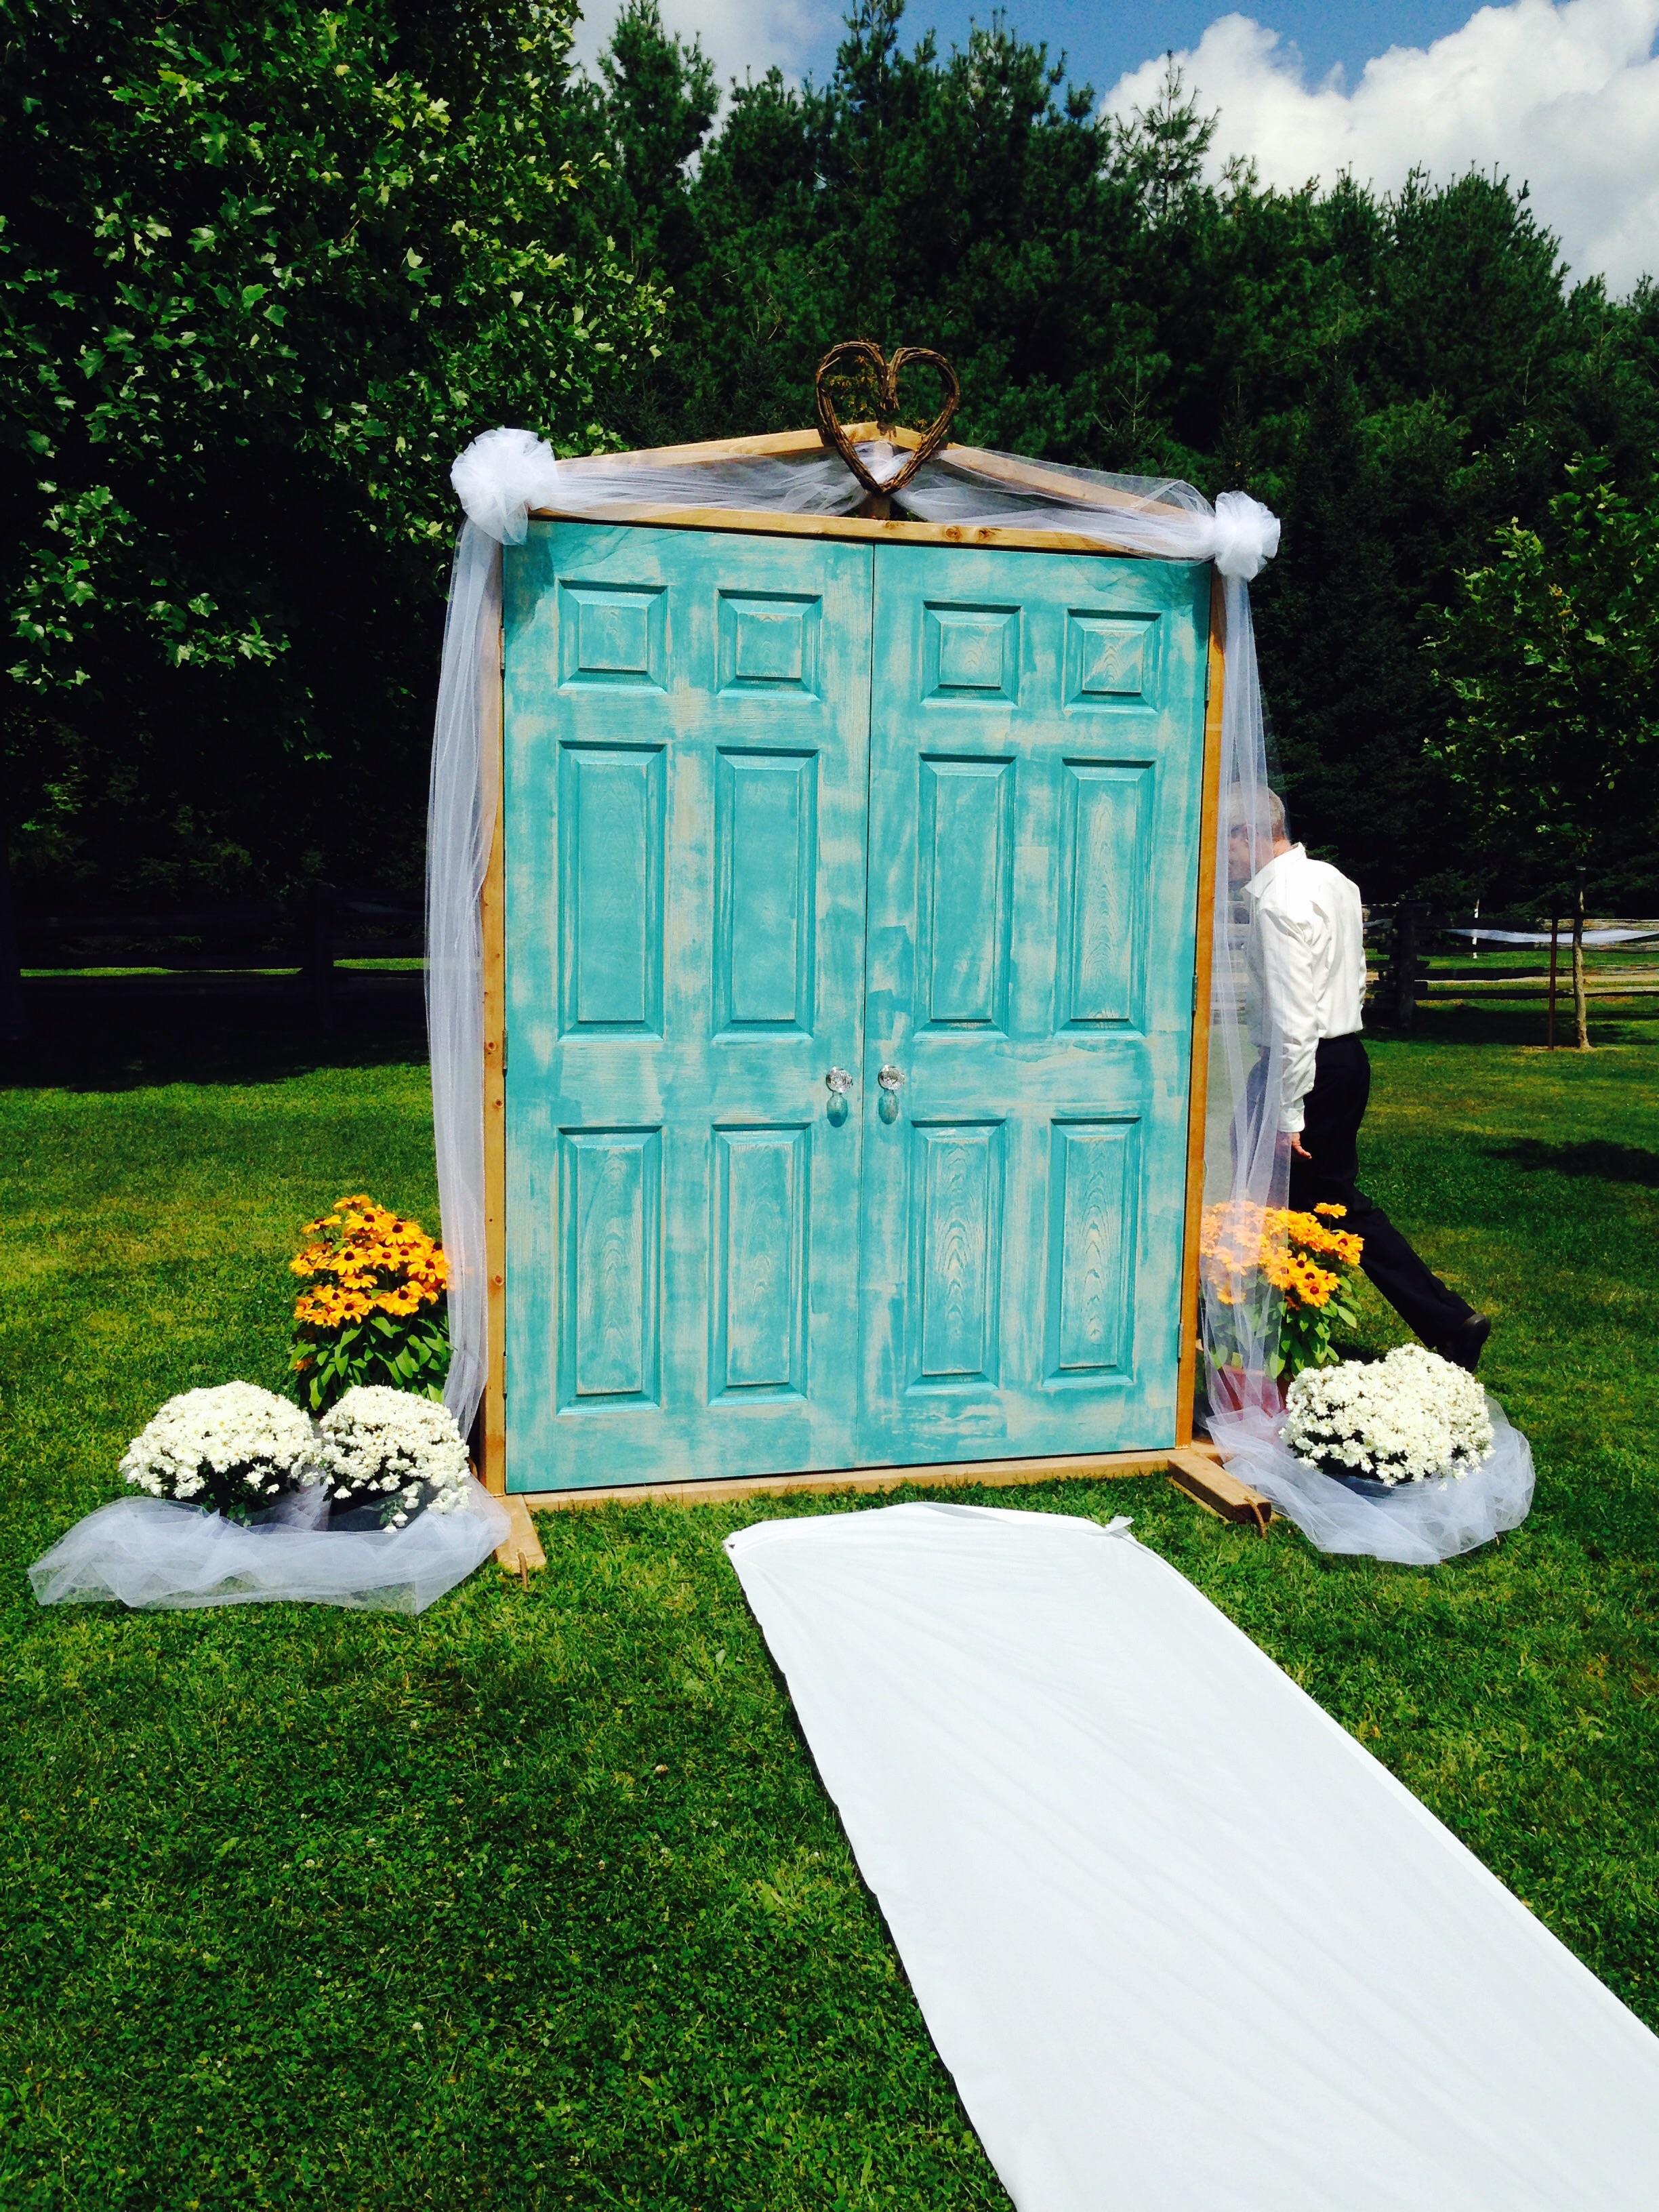 image.jpg 2.6M & Vintage Wedding Doors For Sale \u2014 The Knot